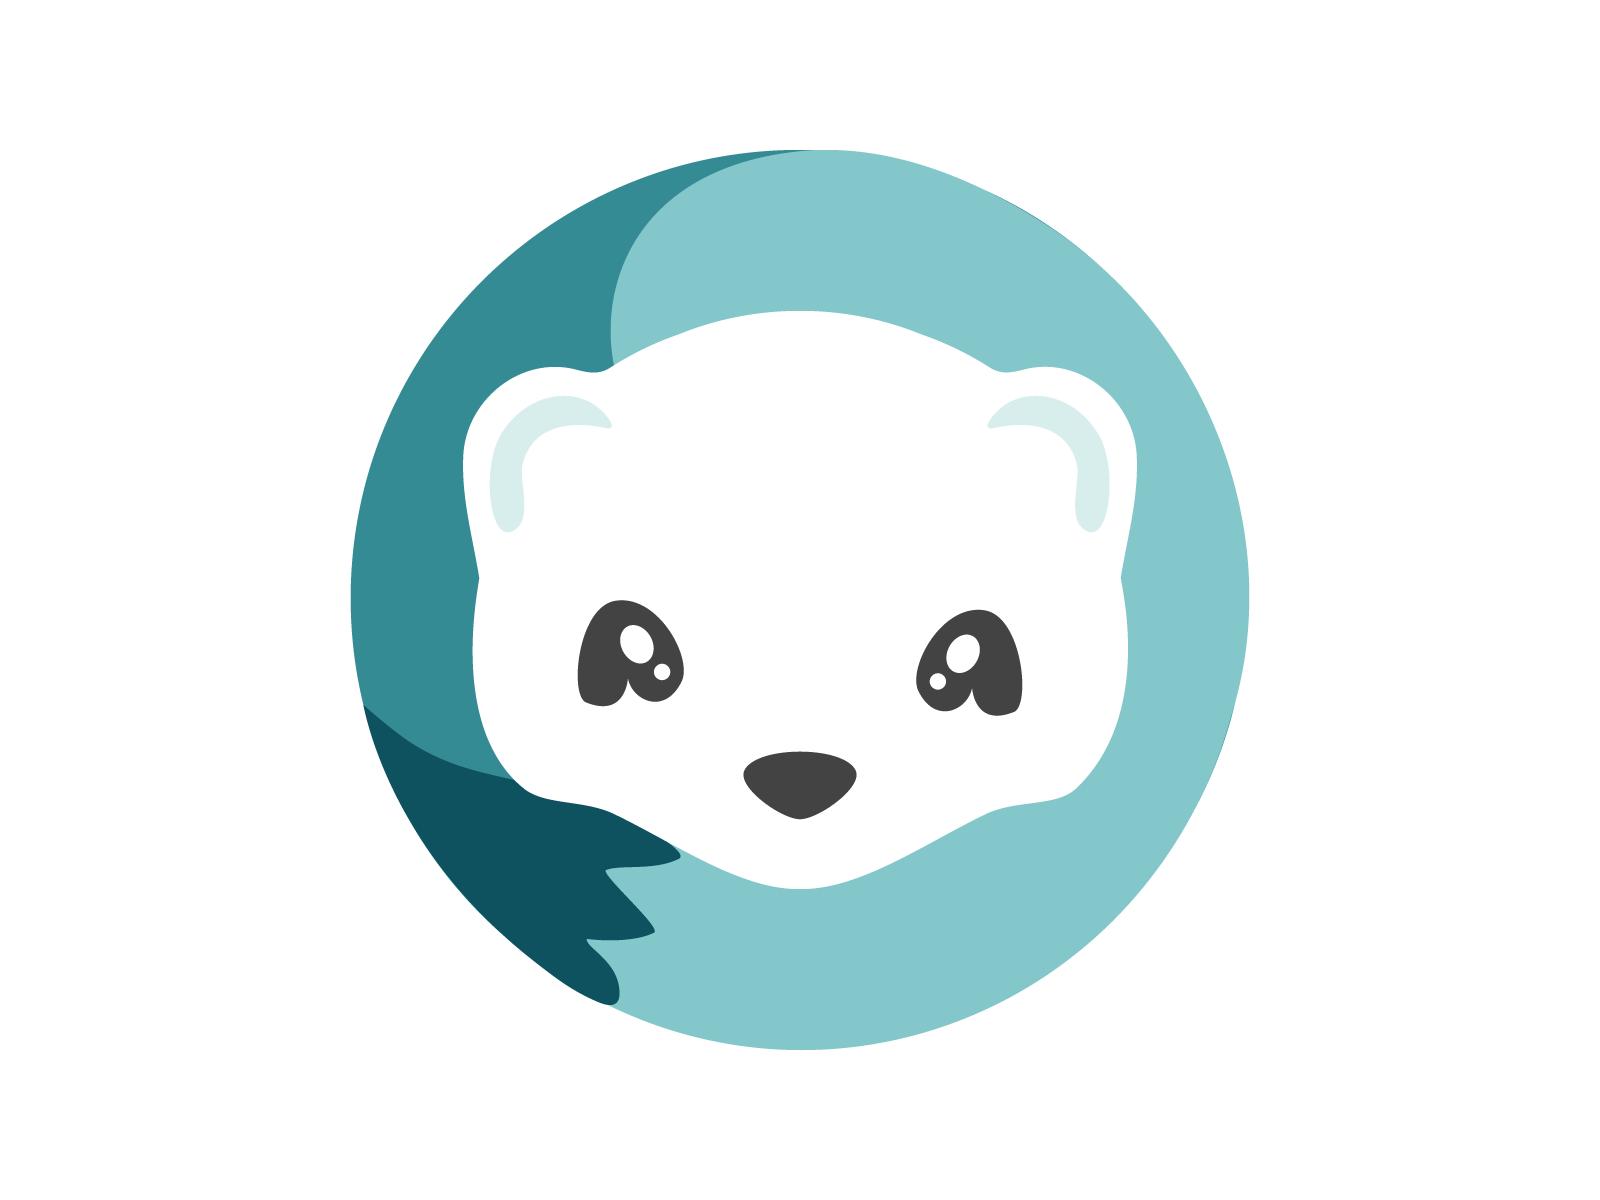 Hermineapp logo